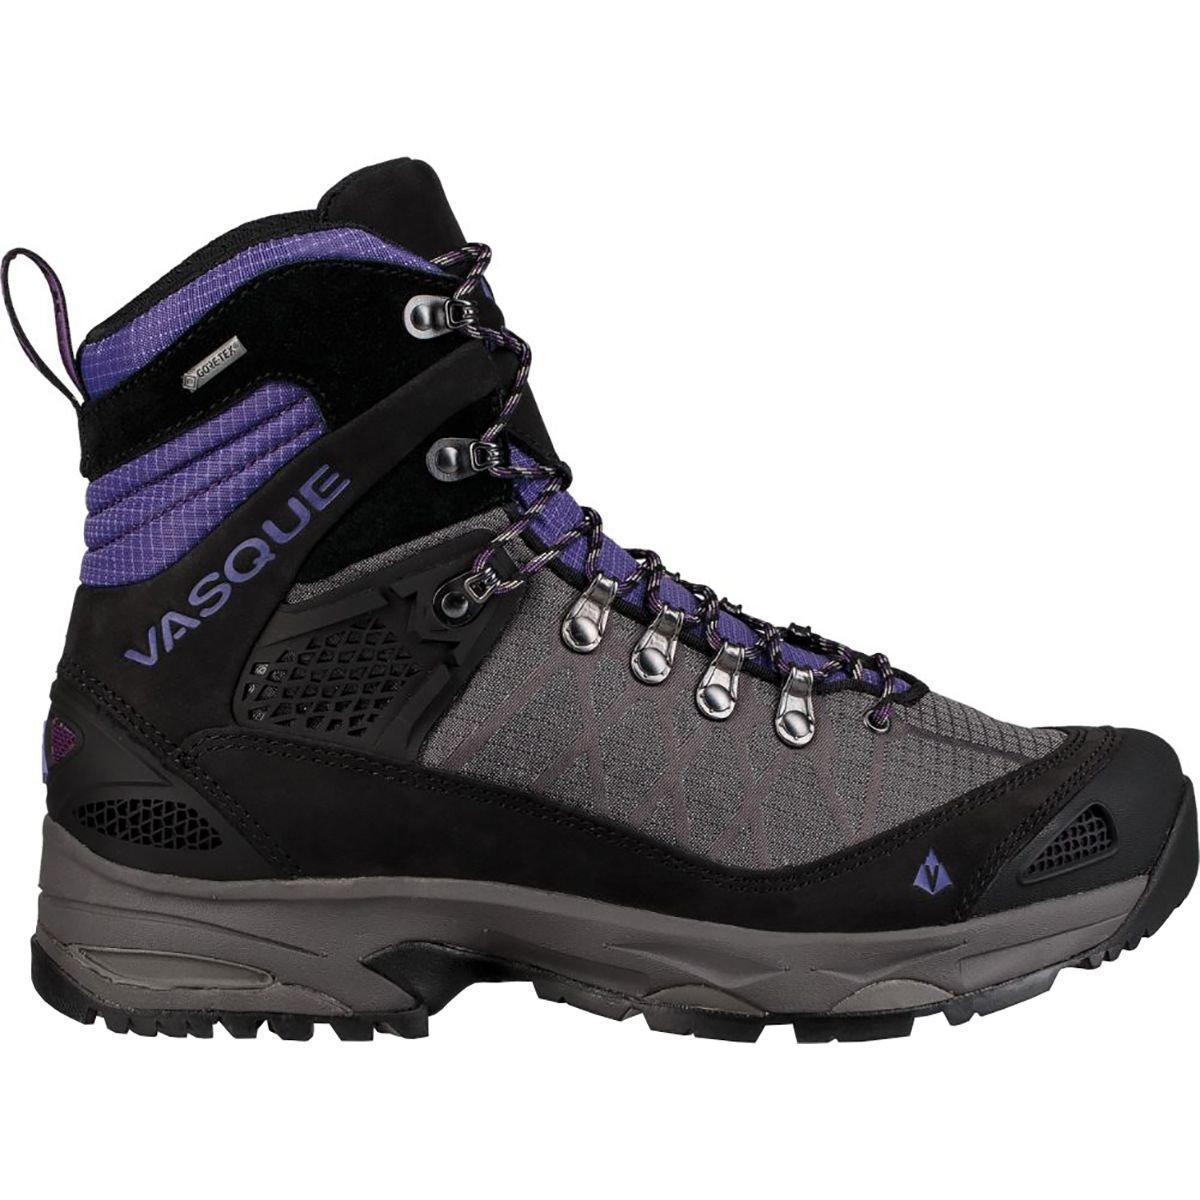 Vasque Saga GTX Backpacking Boot - Women's BlackBerry/Ultra Violet, 7.5 by Vasque